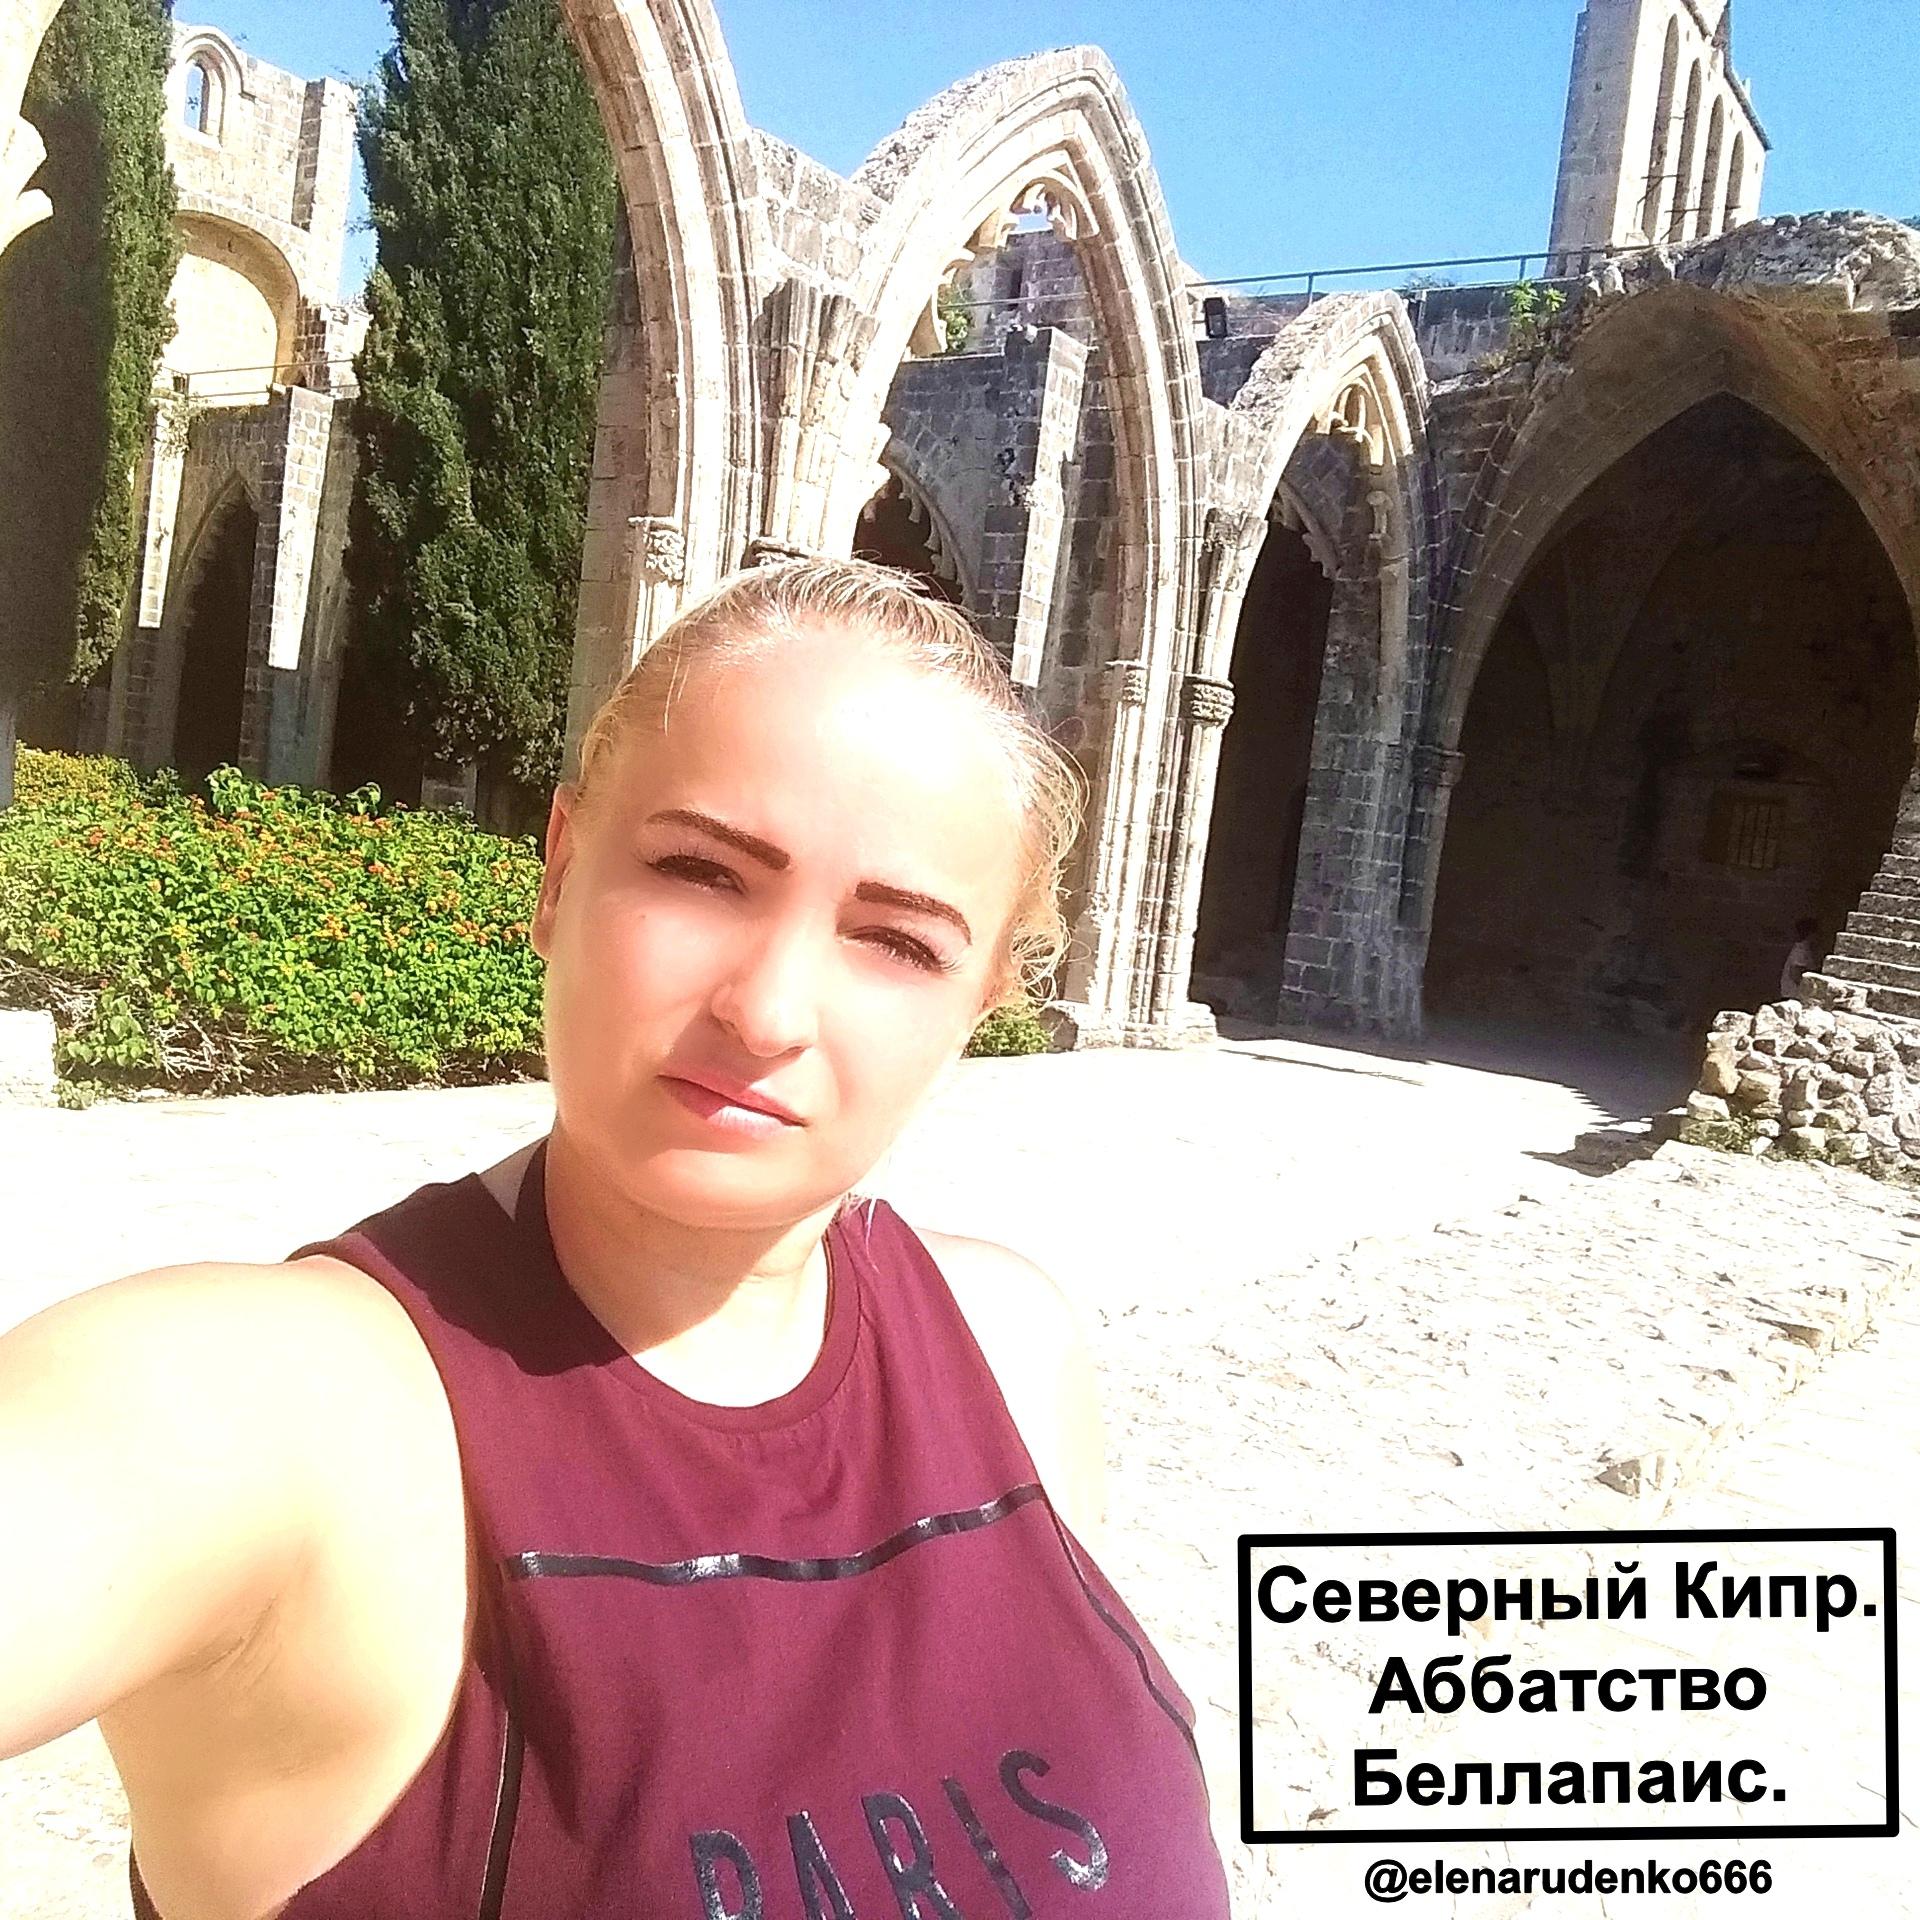 перелет - Елена Руденко. Мои путешествия (фото/видео) - Страница 4 Ef7BCG9xObA